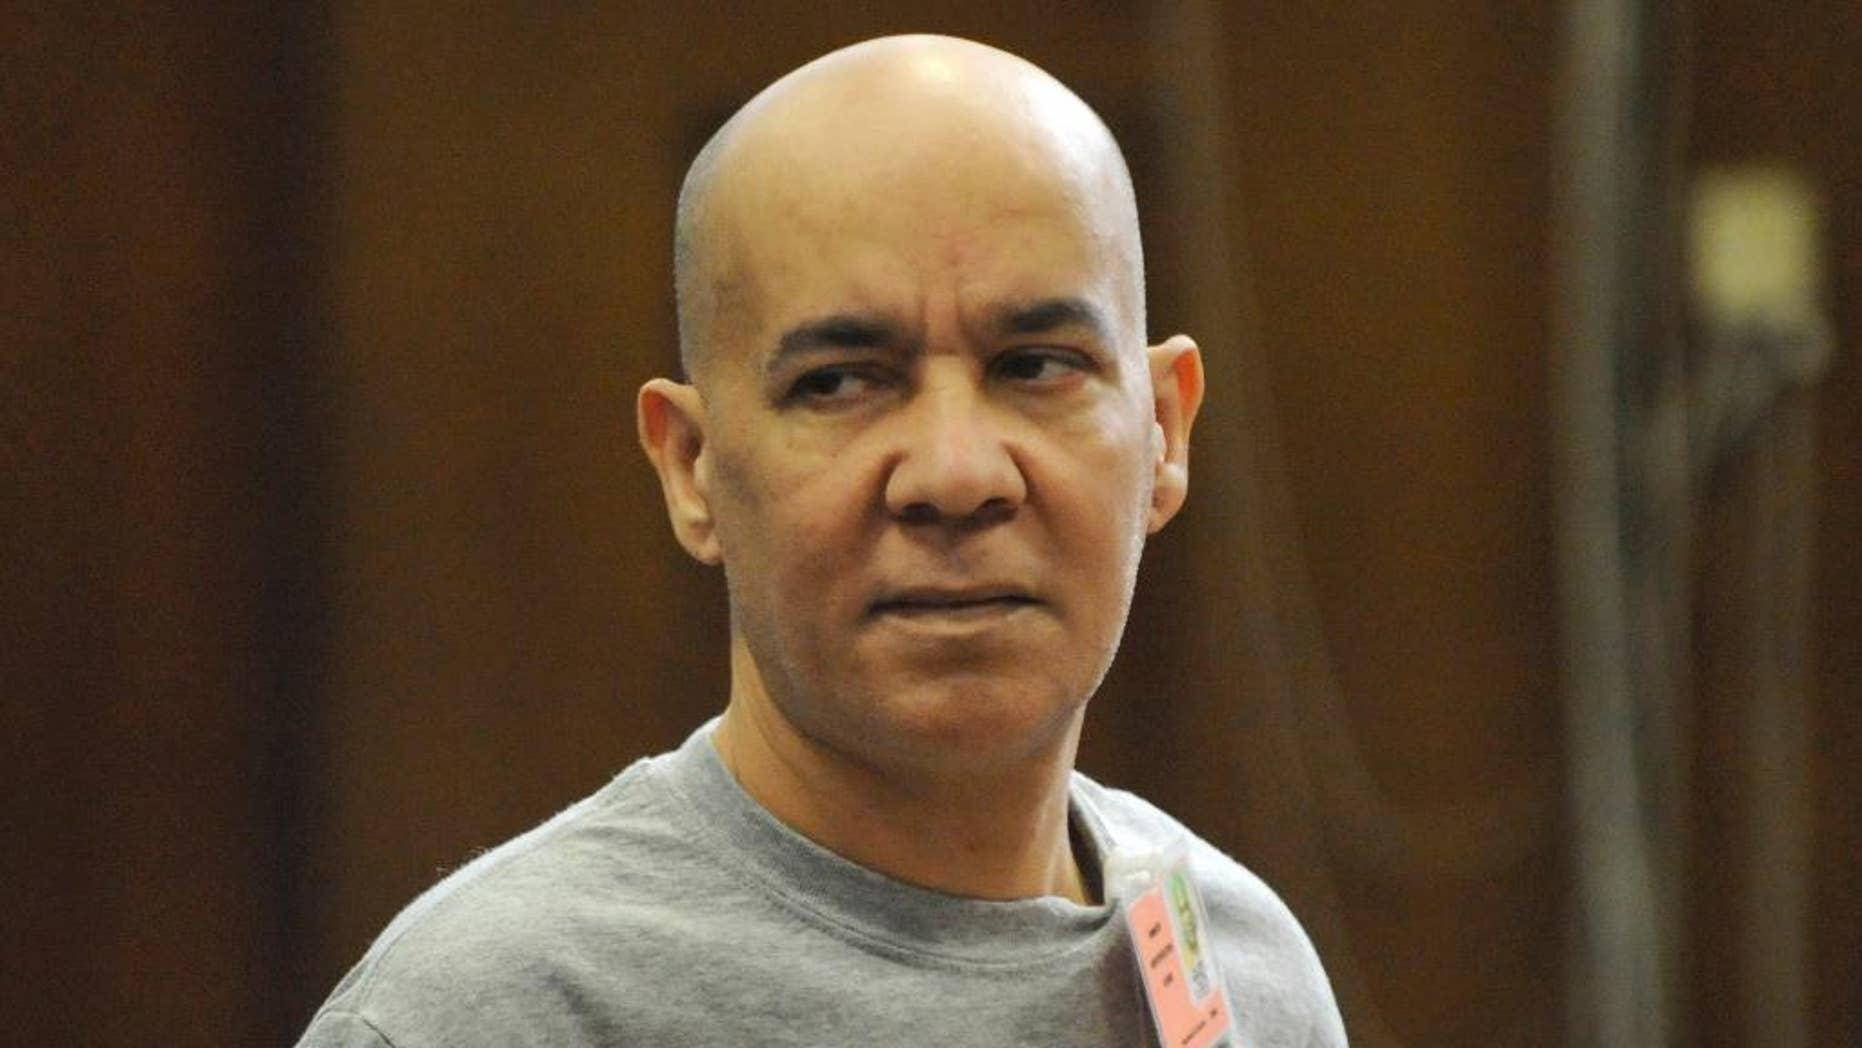 Nov. 15, 2012: In this file photo, Pedro Hernandez appears in Manhattan criminal court in New York. (AP)